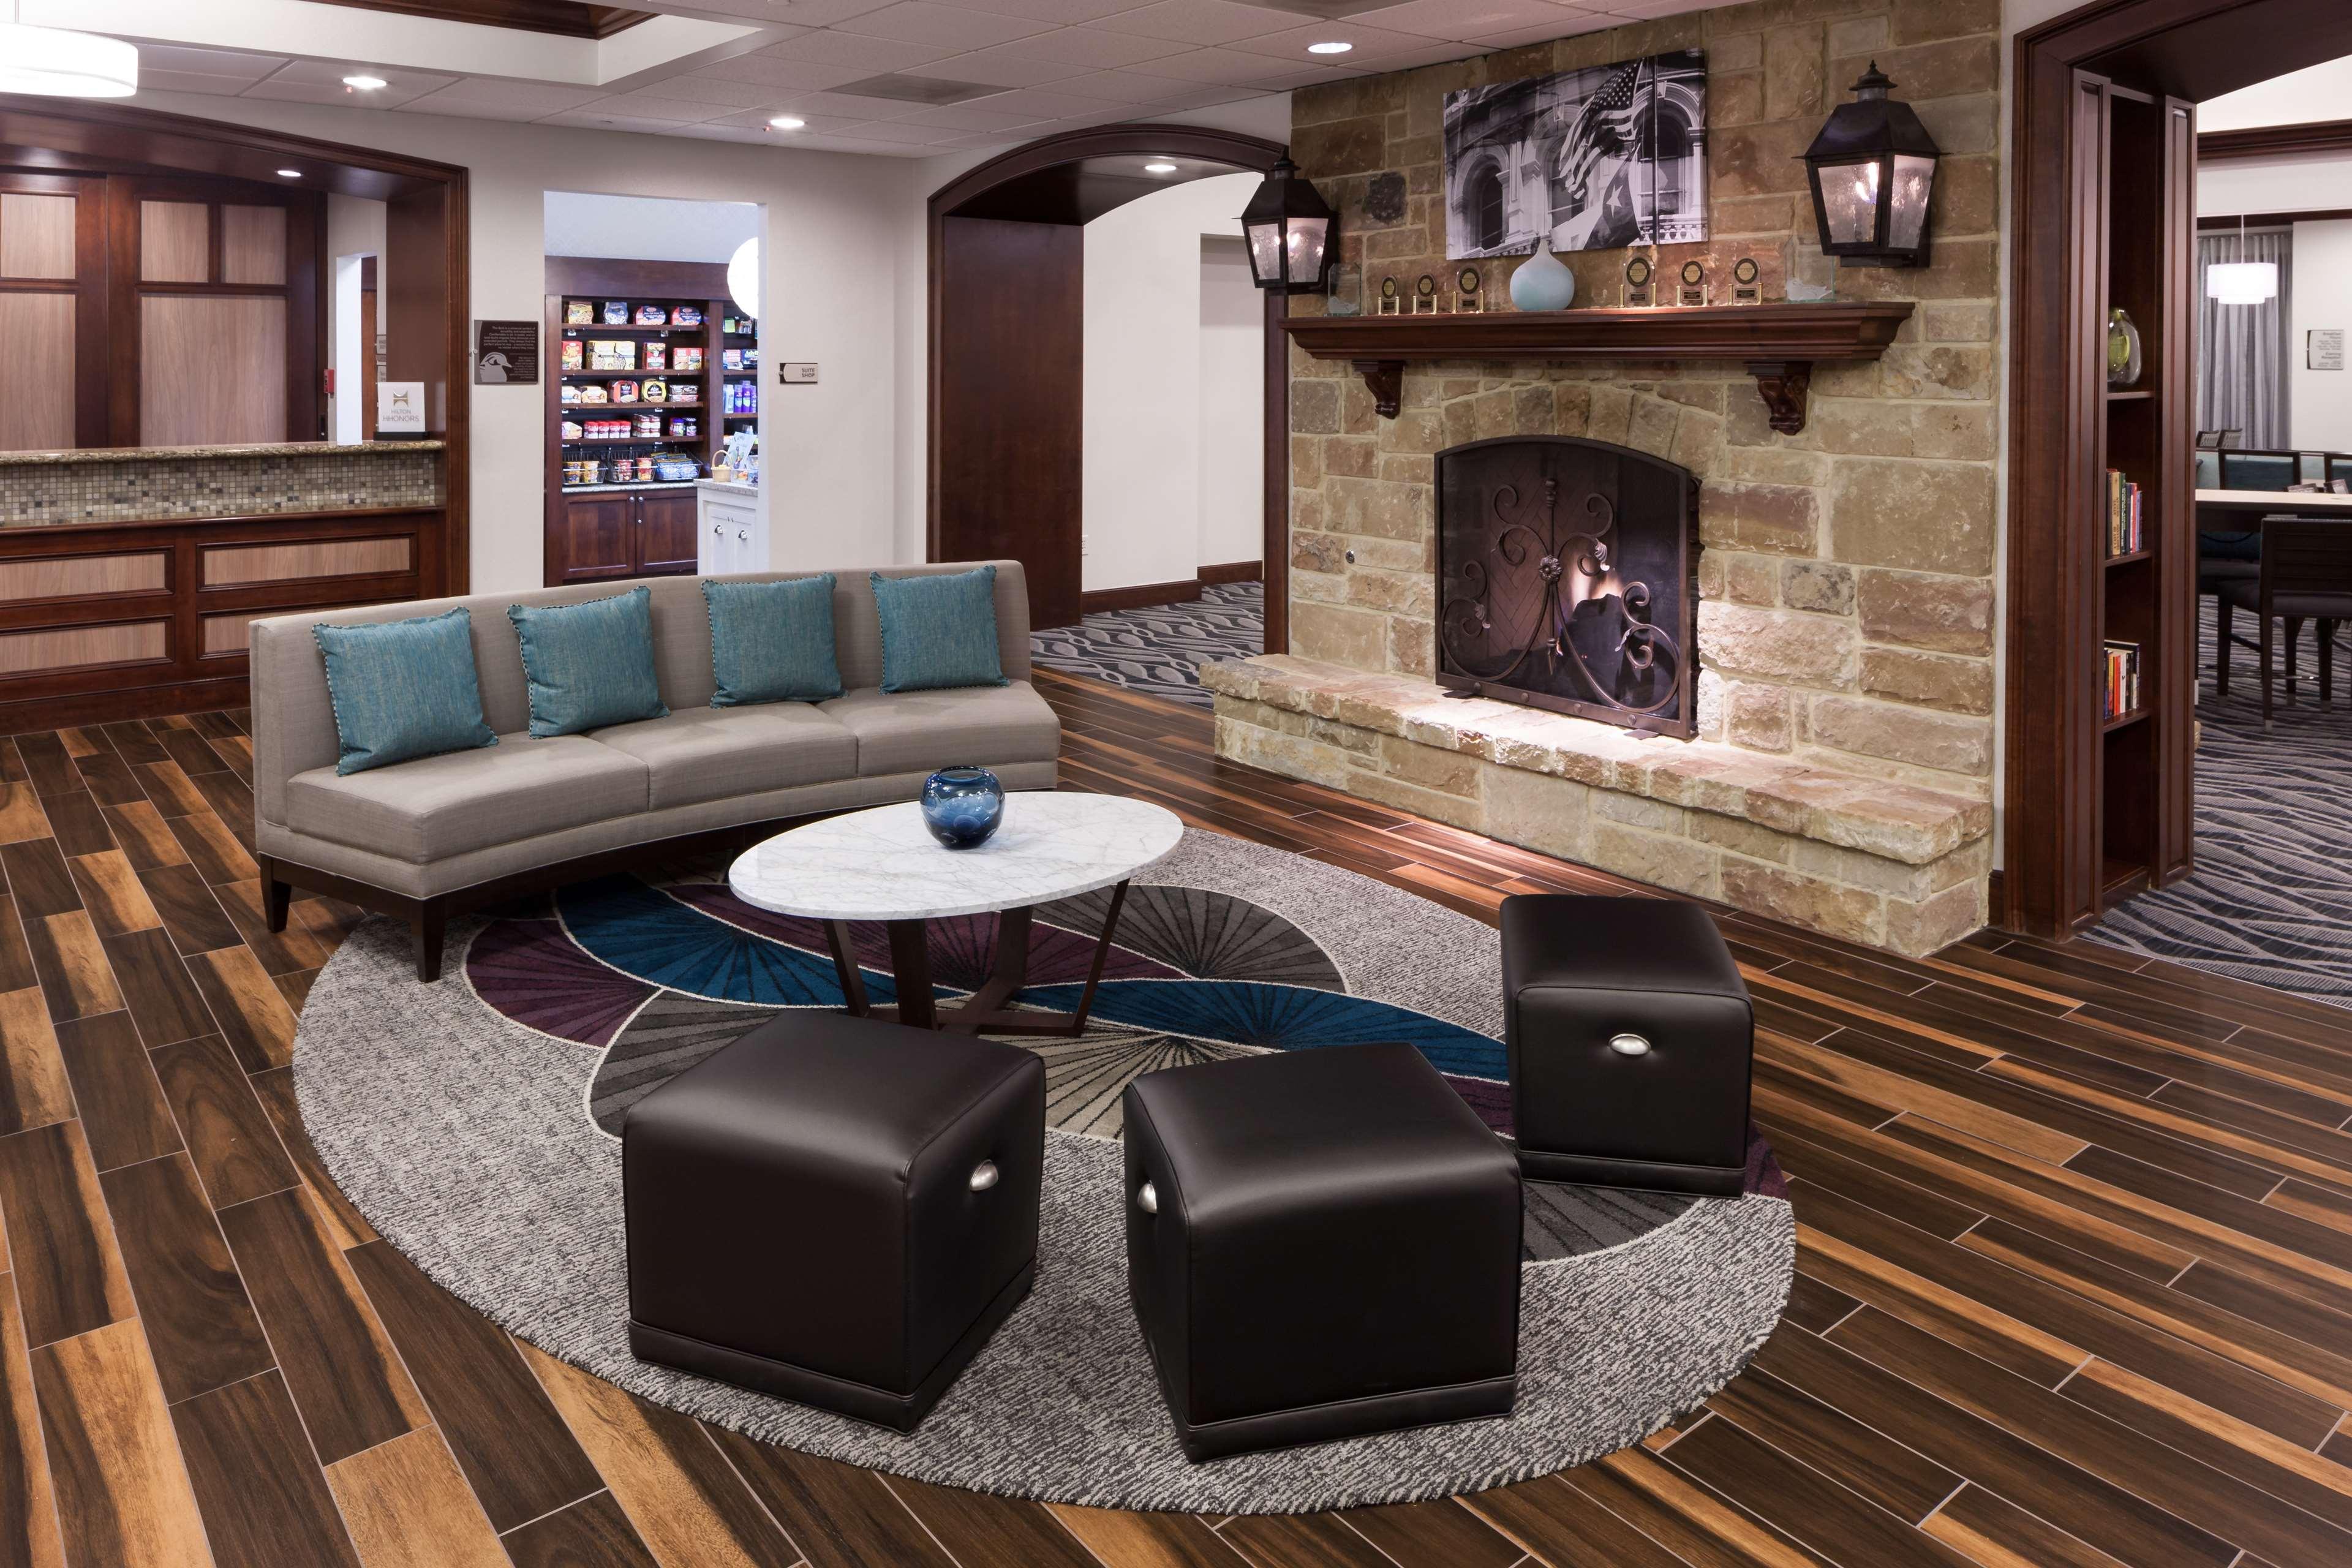 Homewood Suites by Hilton Denton image 5